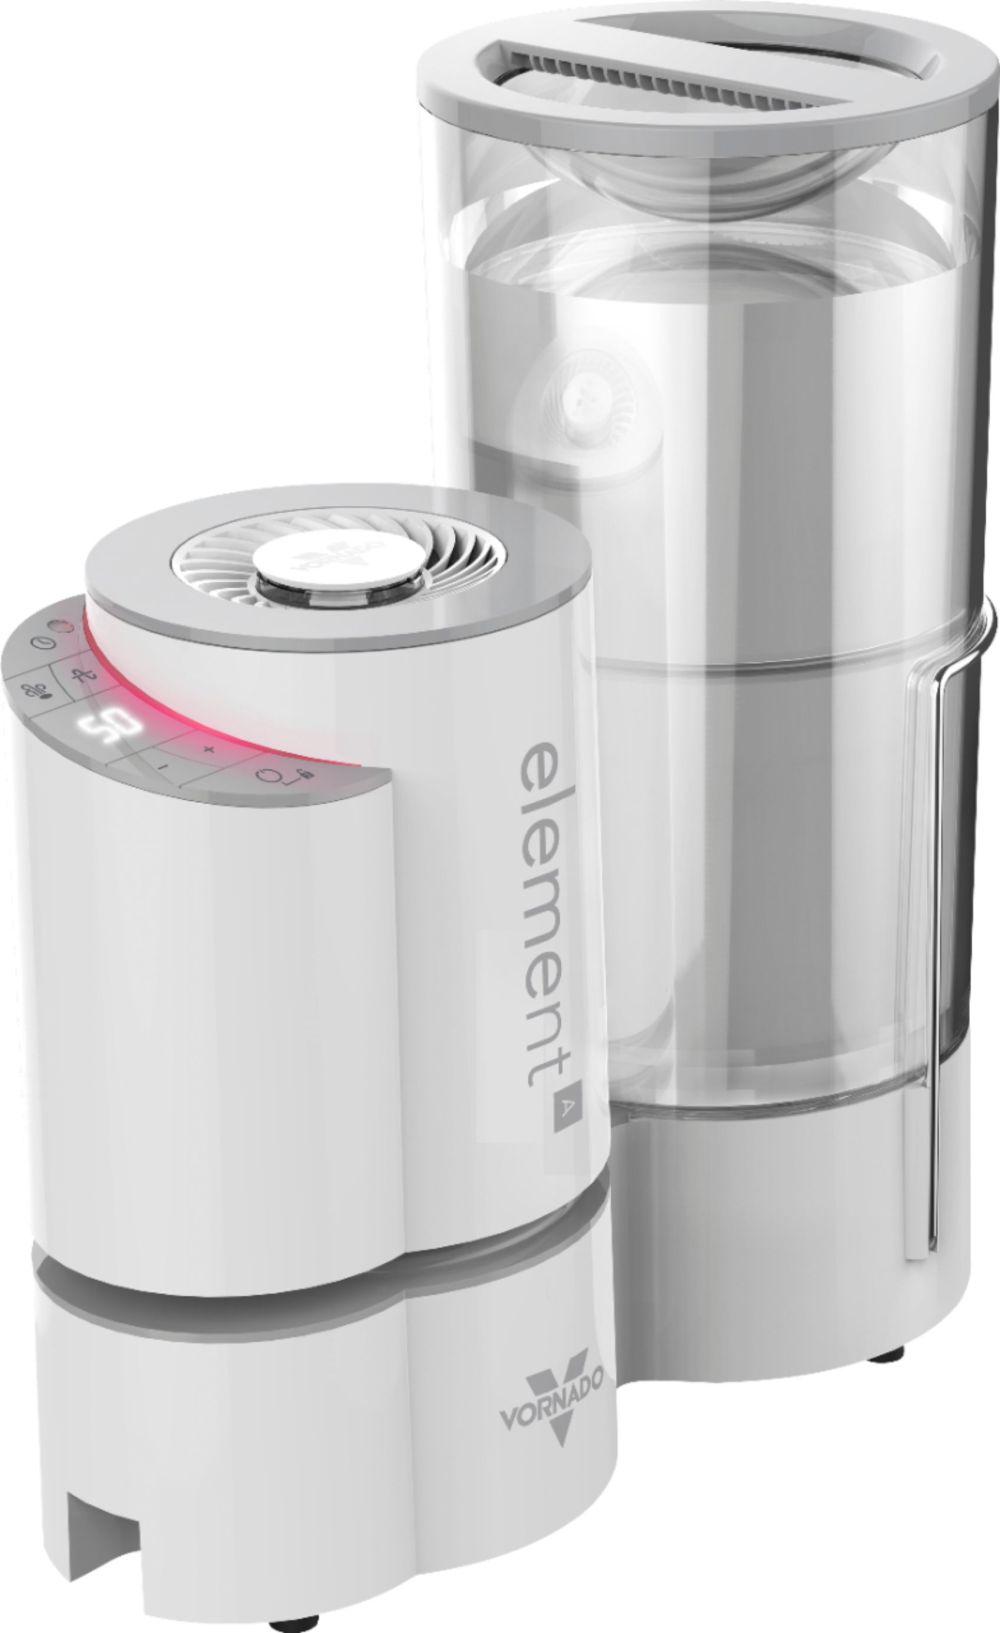 medium resolution of vaporizer humidifier ice element a best buy